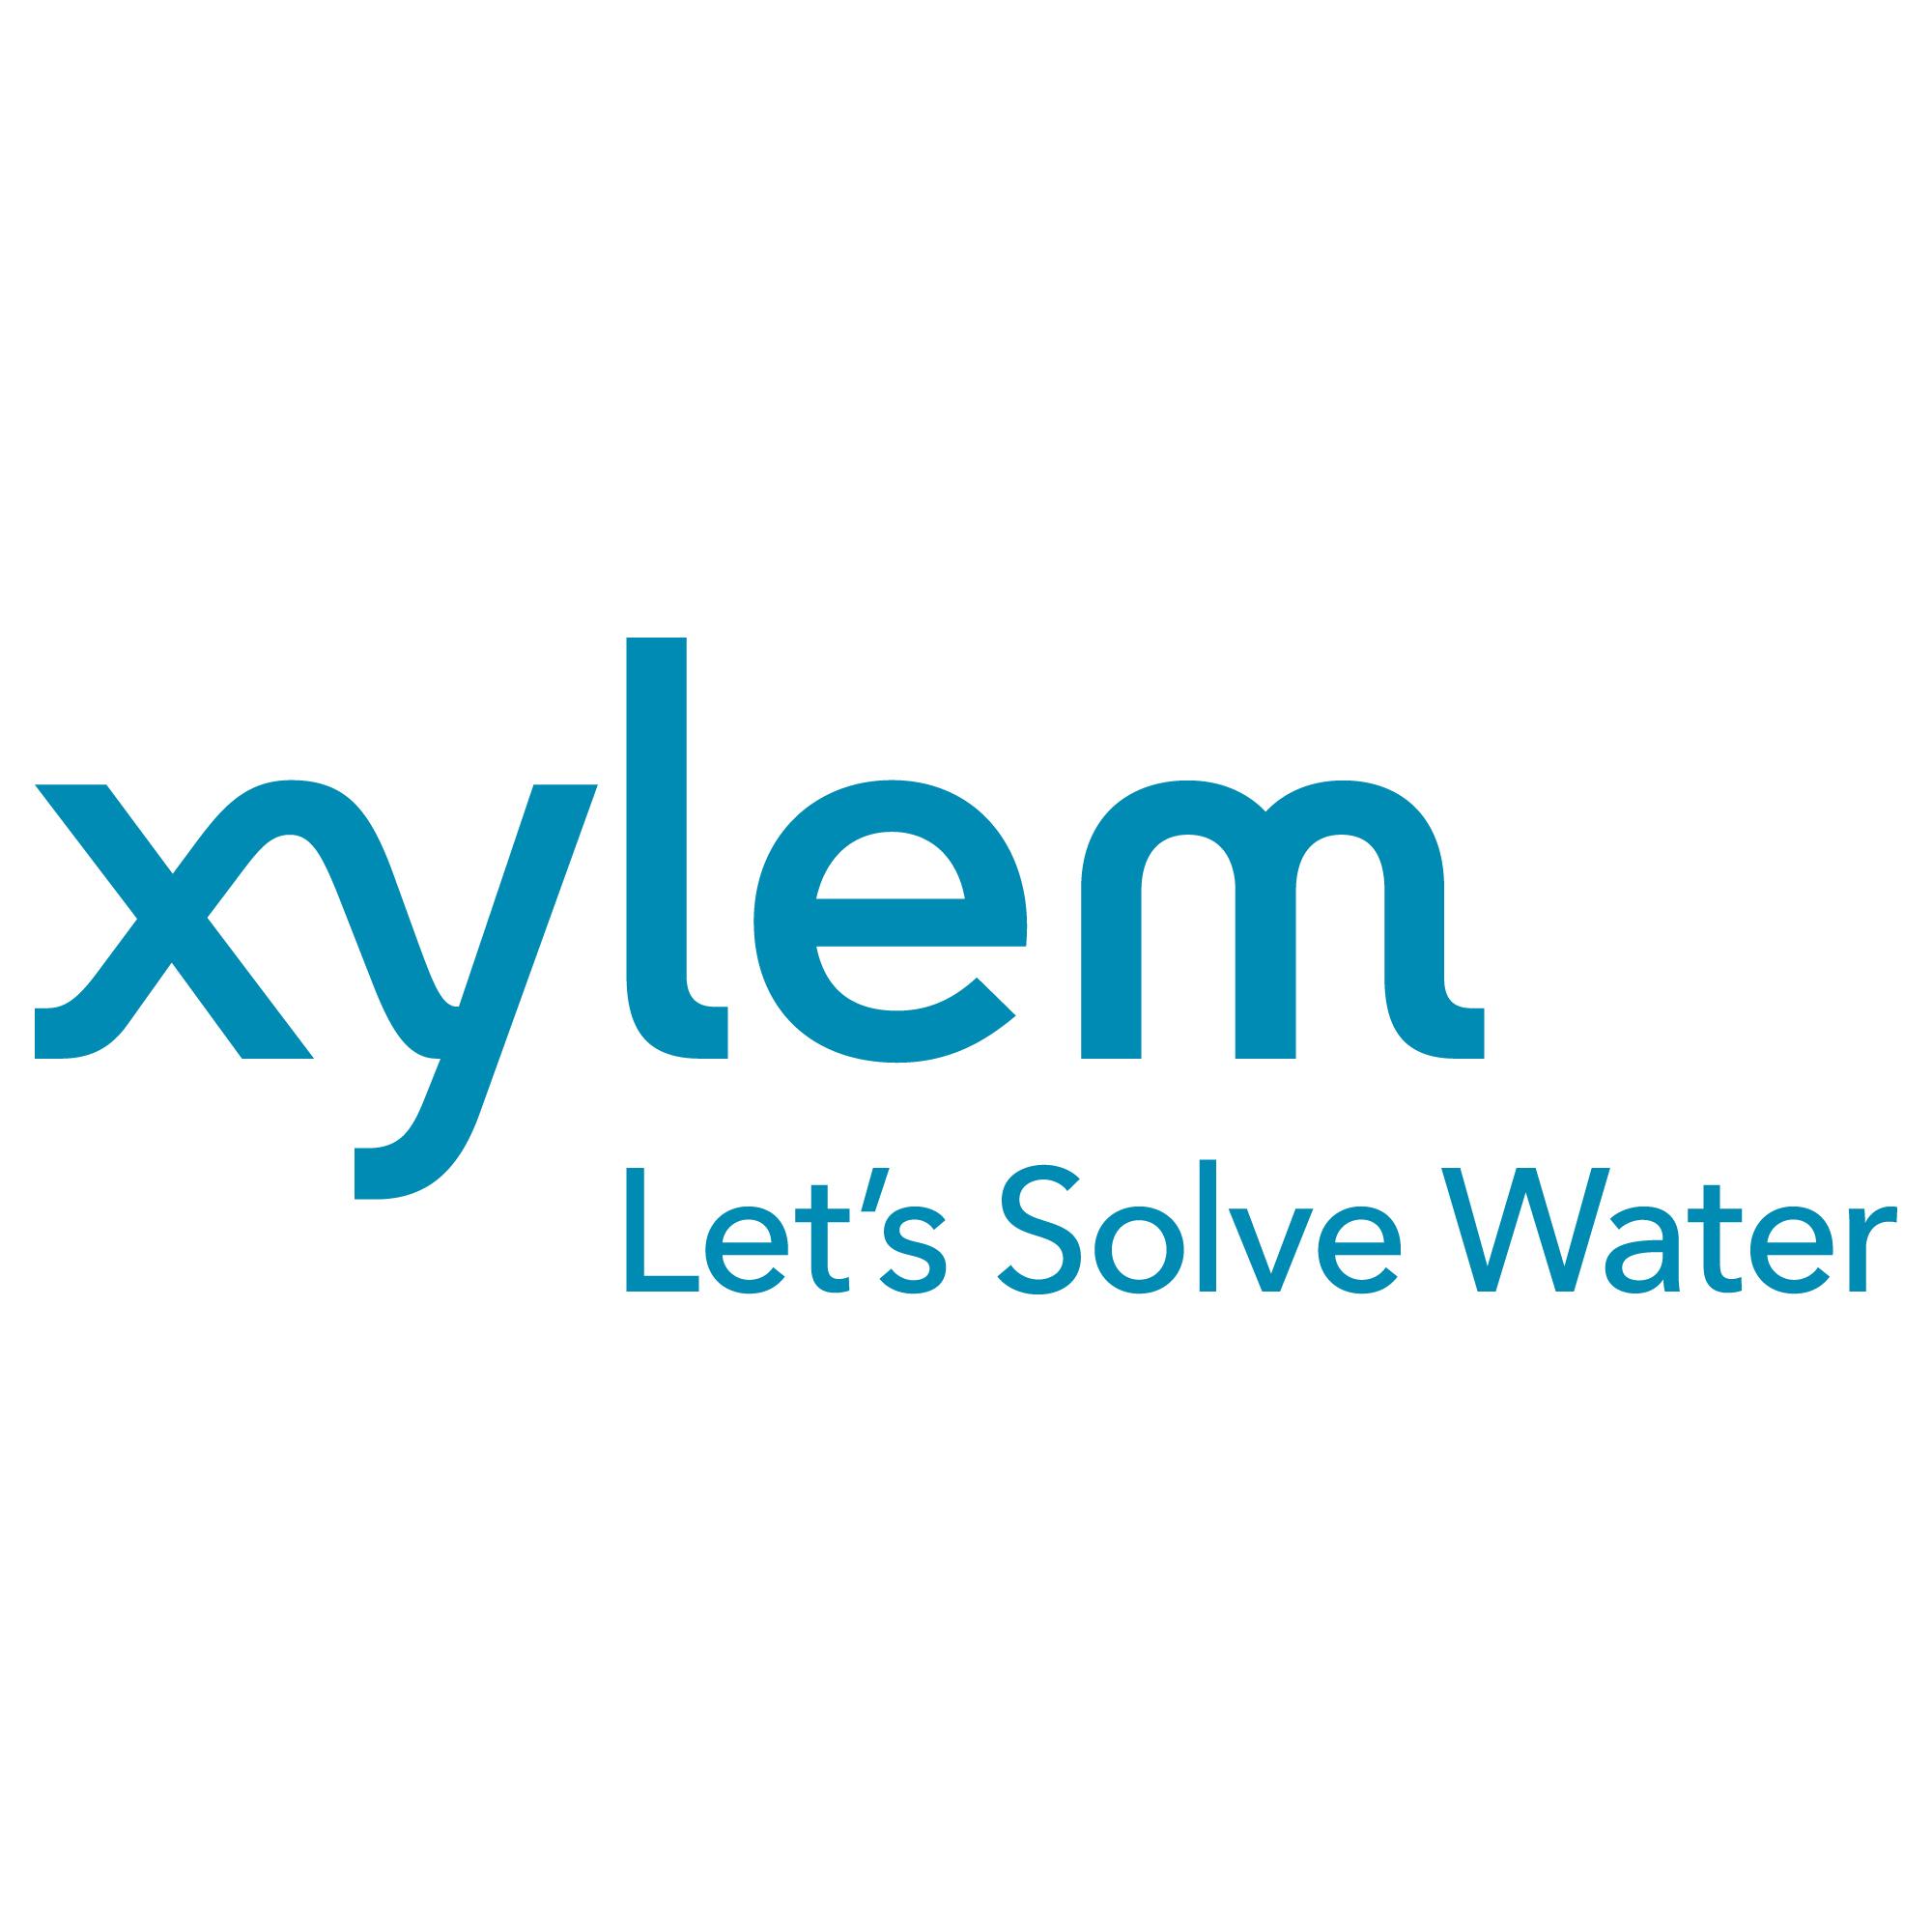 XYLEM square